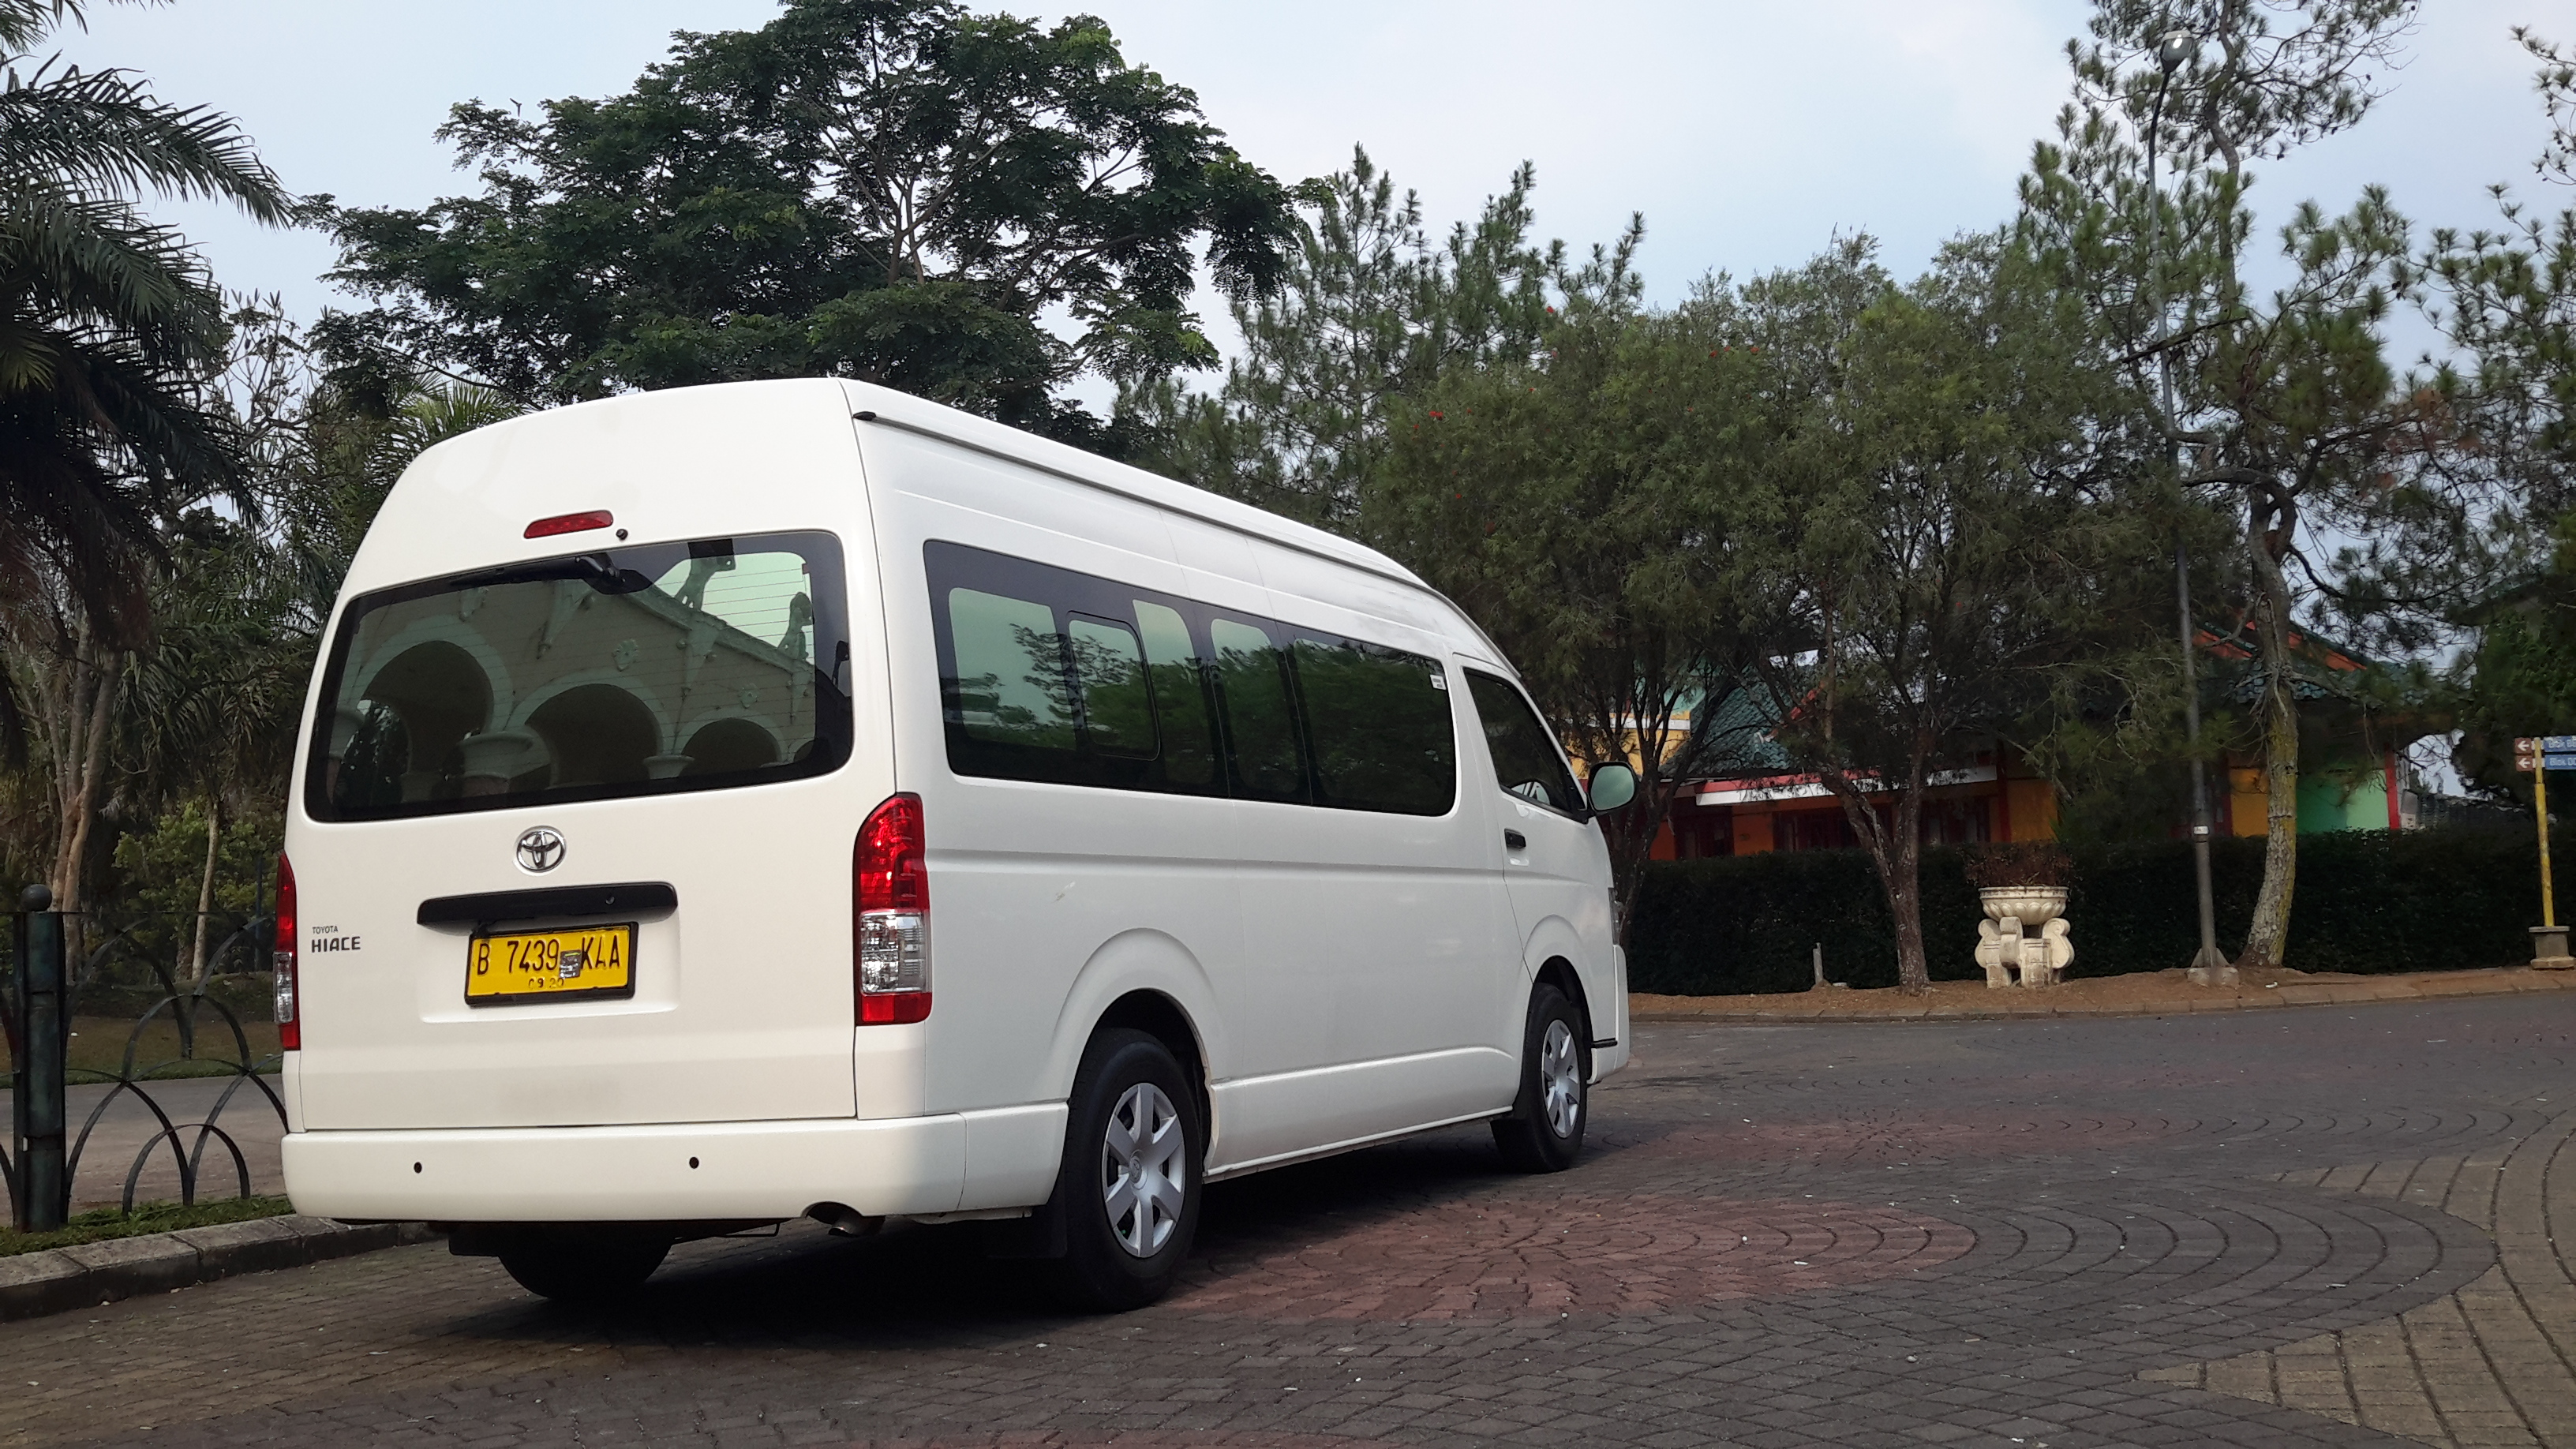 Rental Hiace Tangerang Selatan 081284670628